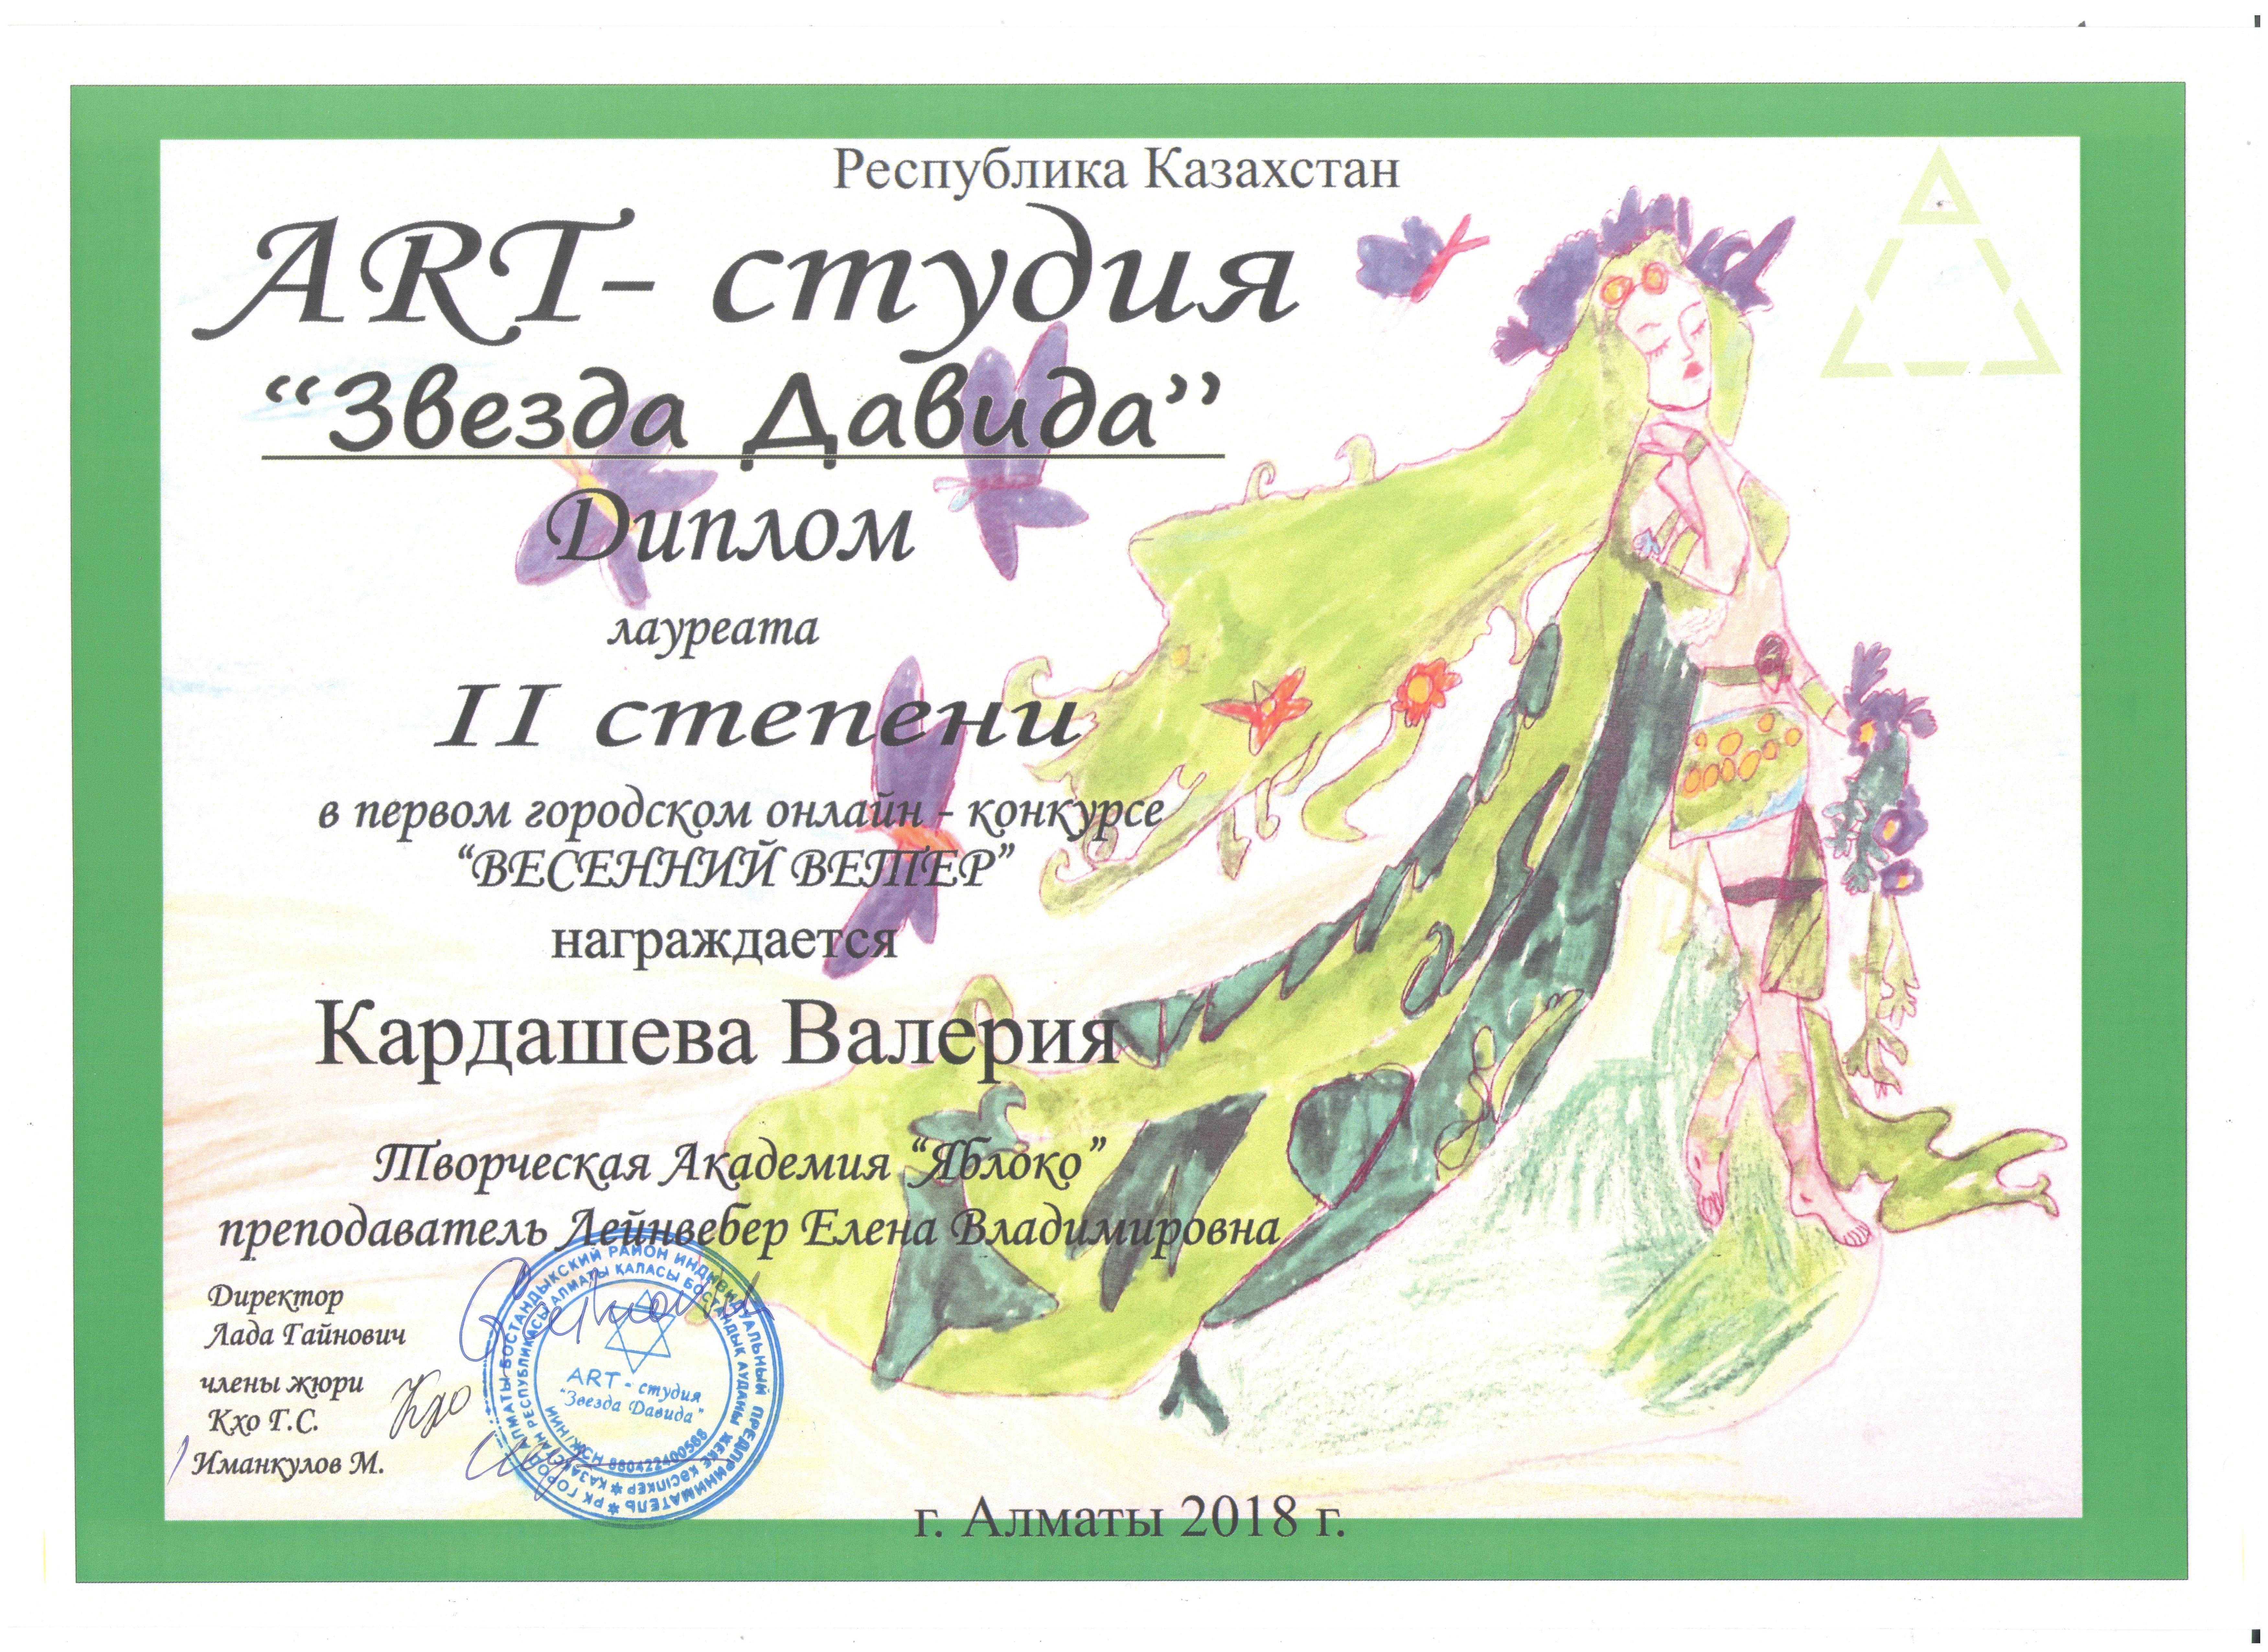 Кардашева Валерия, 9 лет